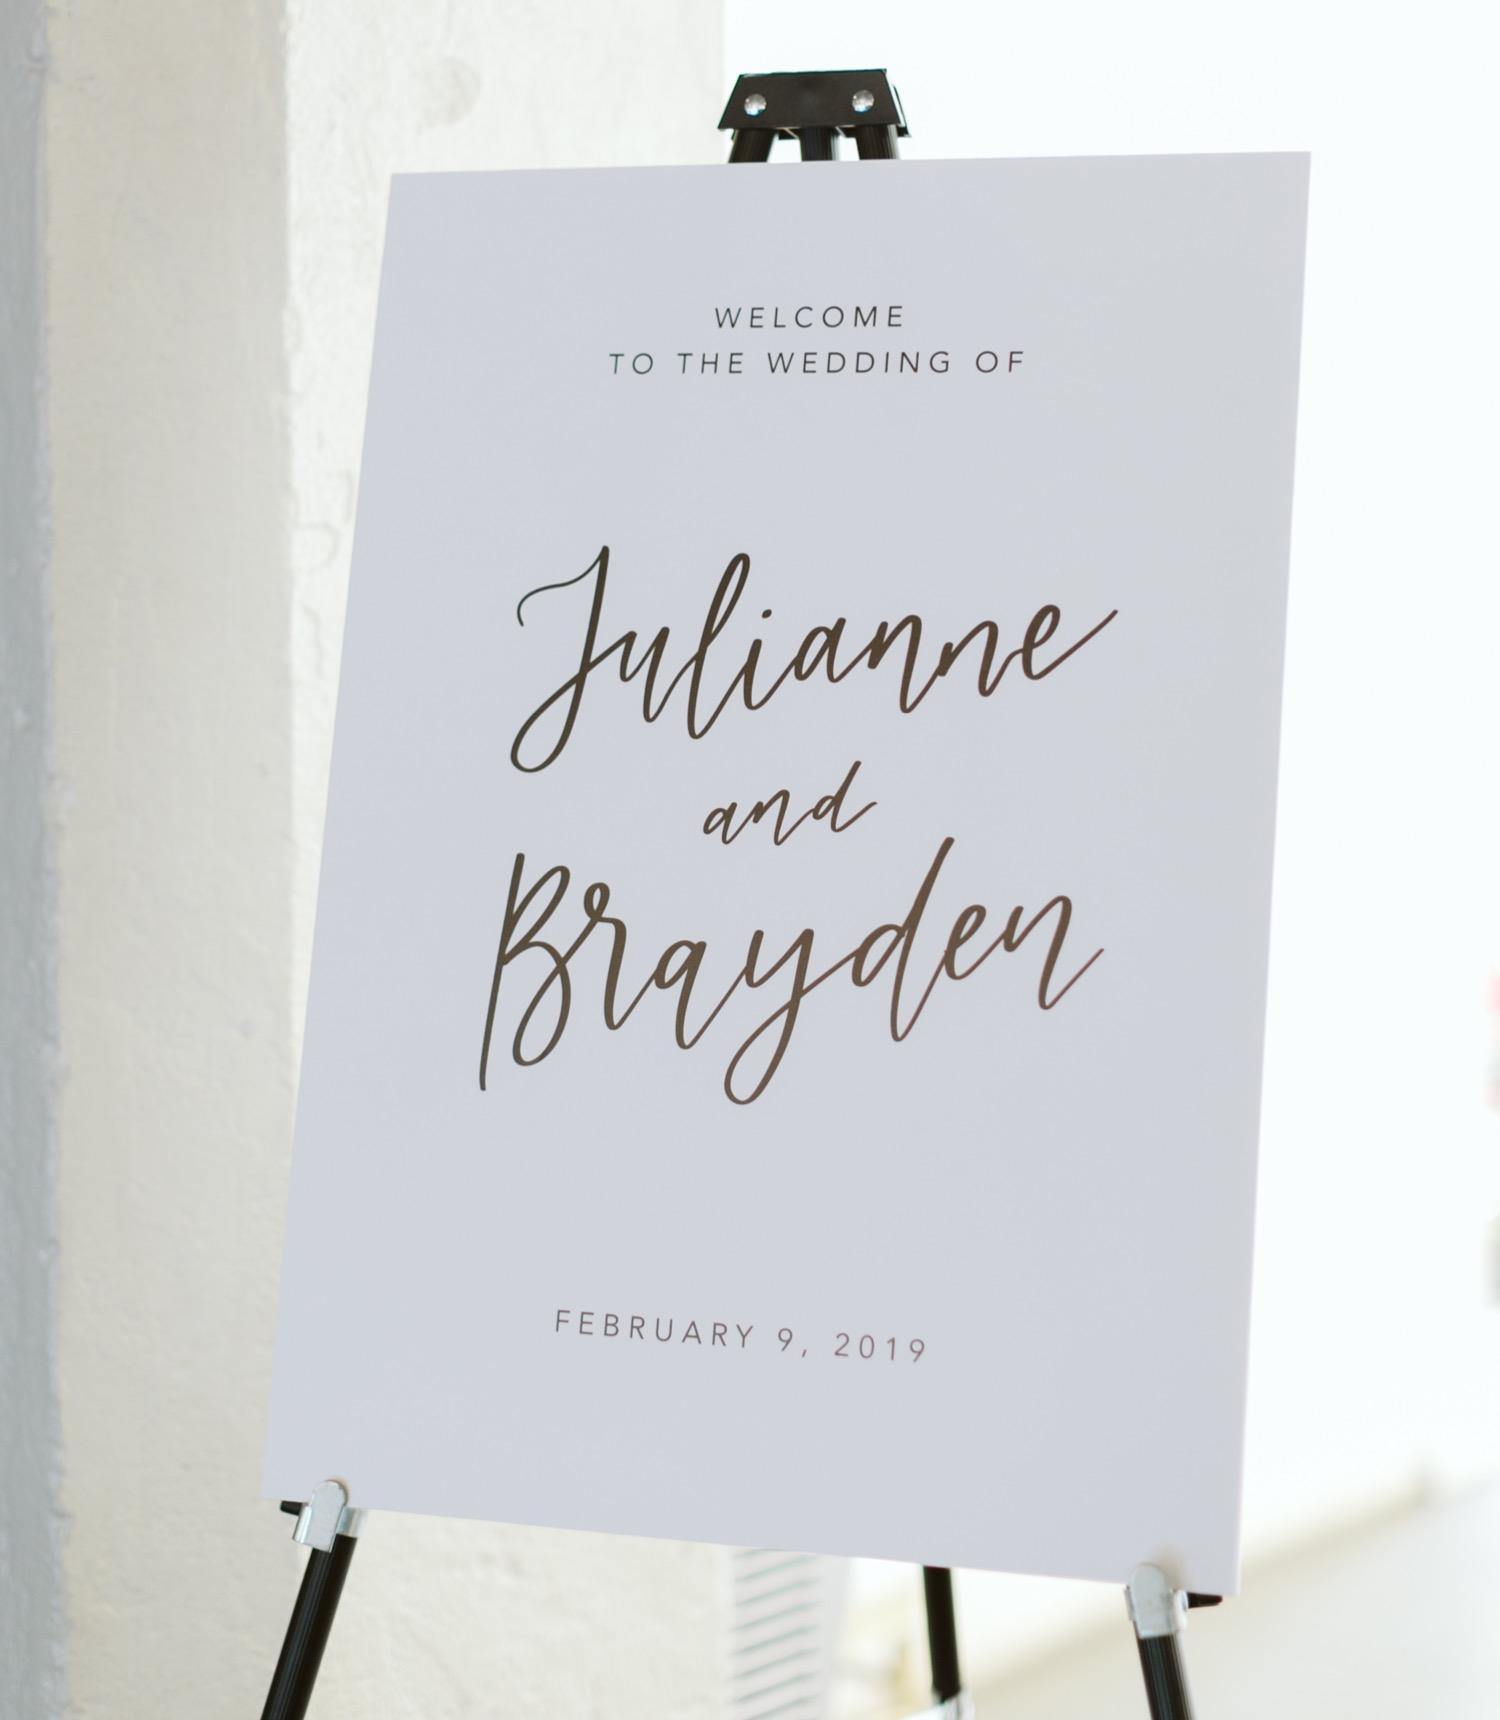 002_Brayden-Julianne-Wedding-50_for_Cafe_Julia_Welcome_Wedding_Sign.jpg